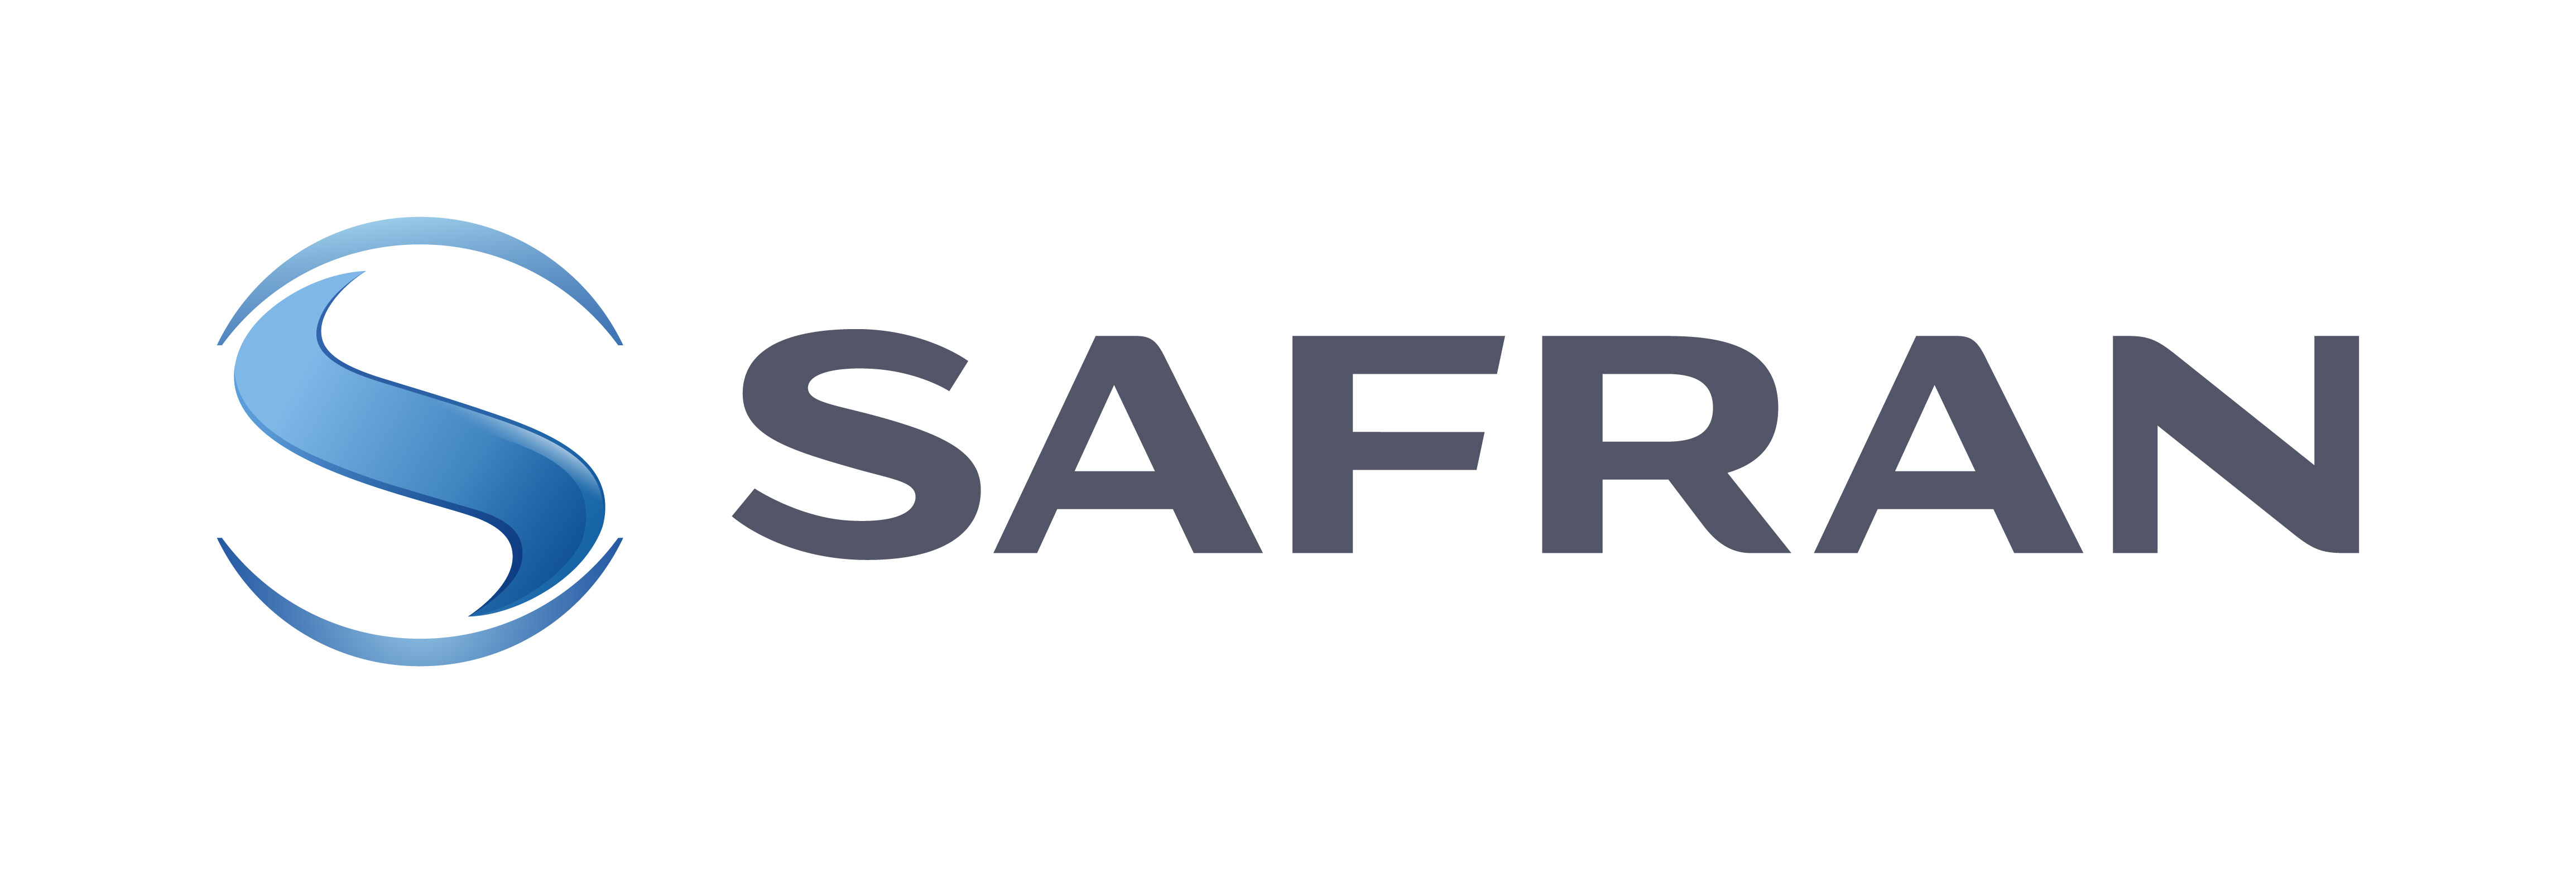 Safran Jobs Ehscareers